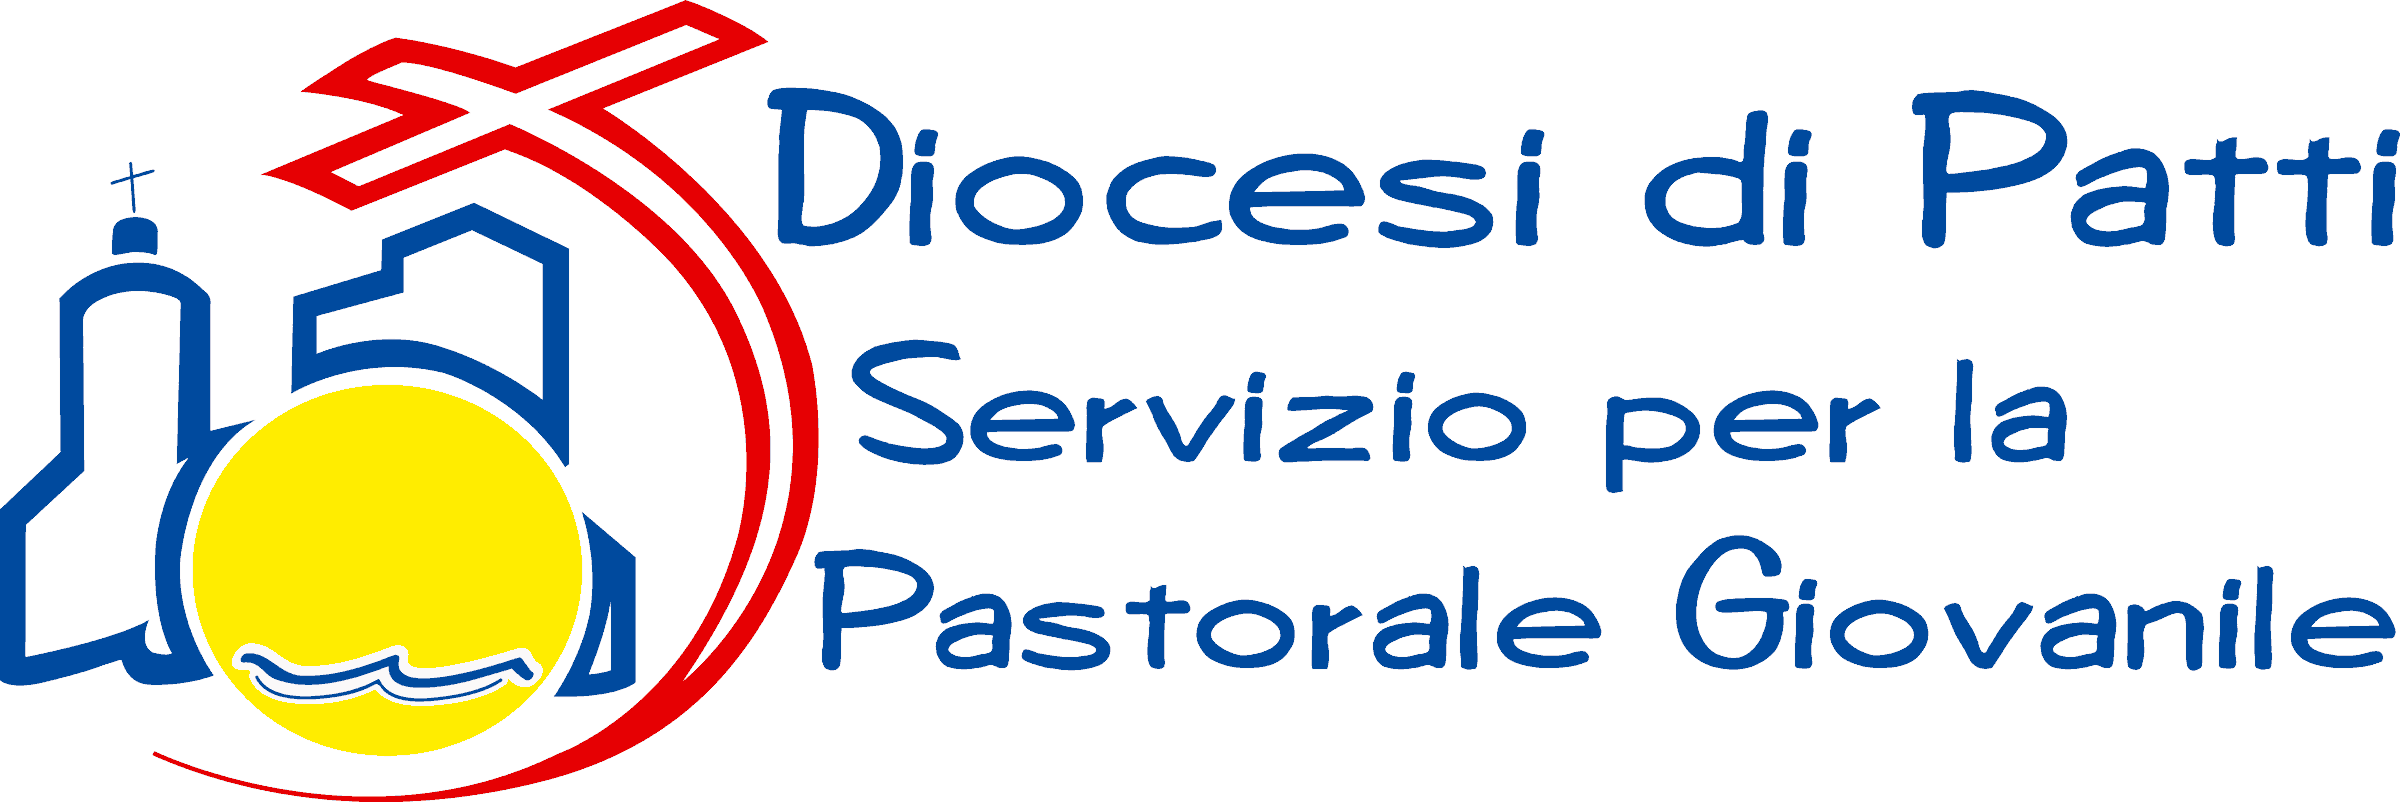 DIOCESI DI PATTI